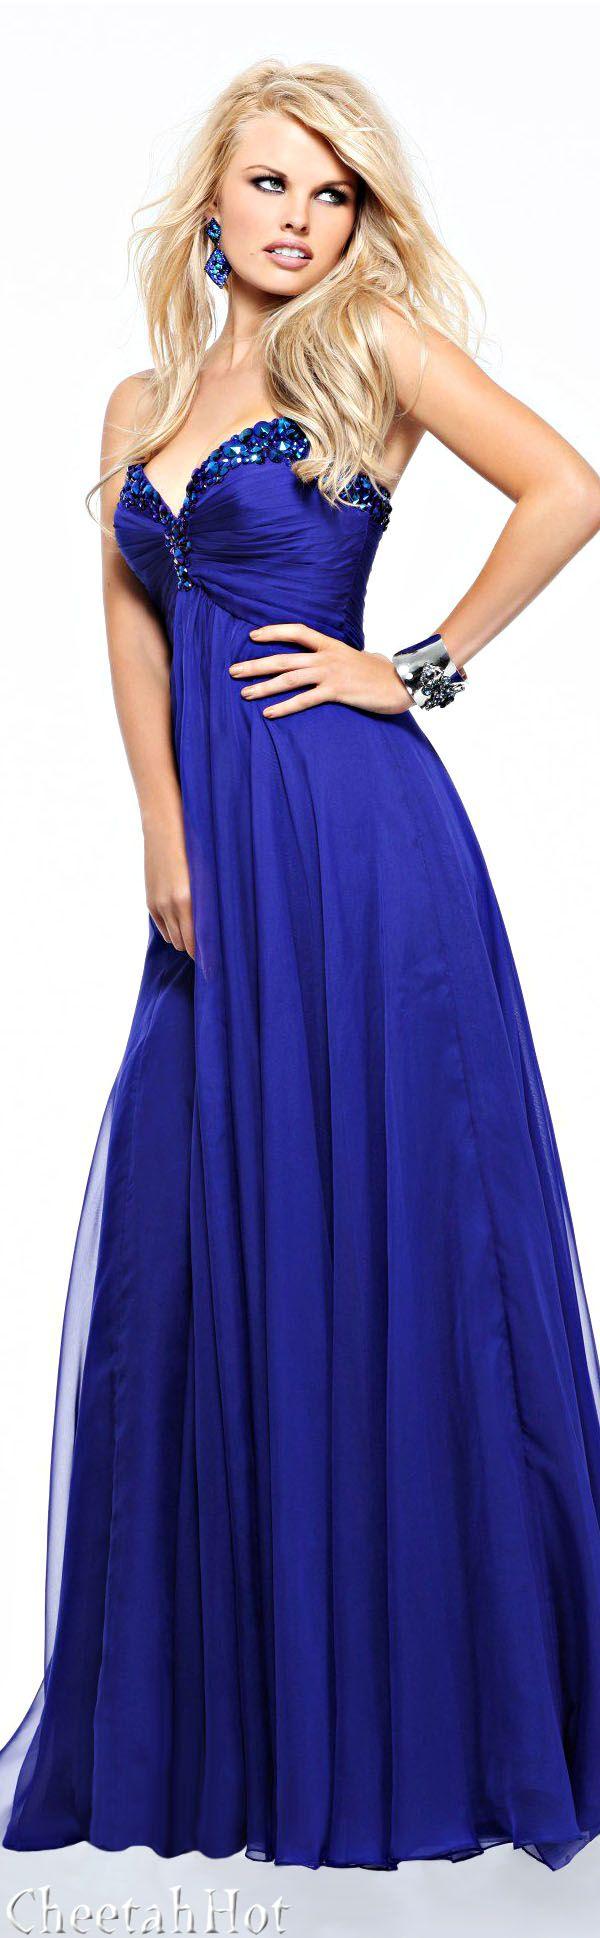 Cheetahhot style and fashion dresses modas pinterest purple